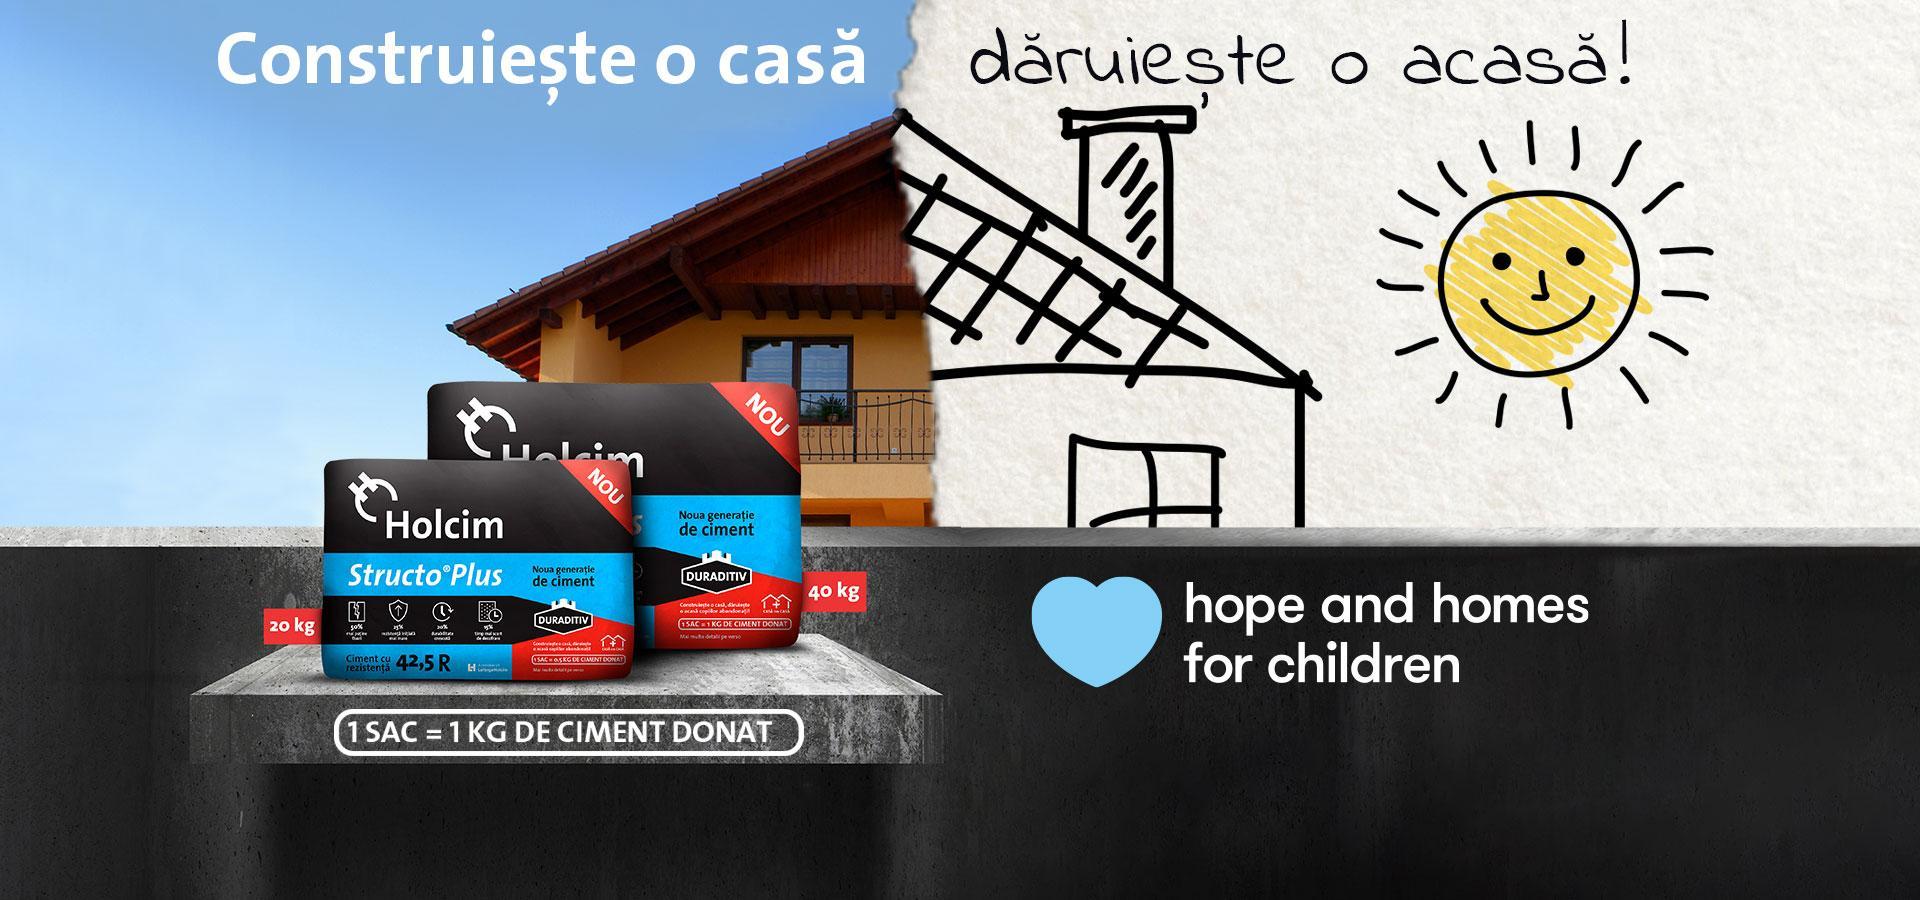 Case pentru copiii instituționalizați, construite în Neamț de Hope and Homes for Children și Holcim